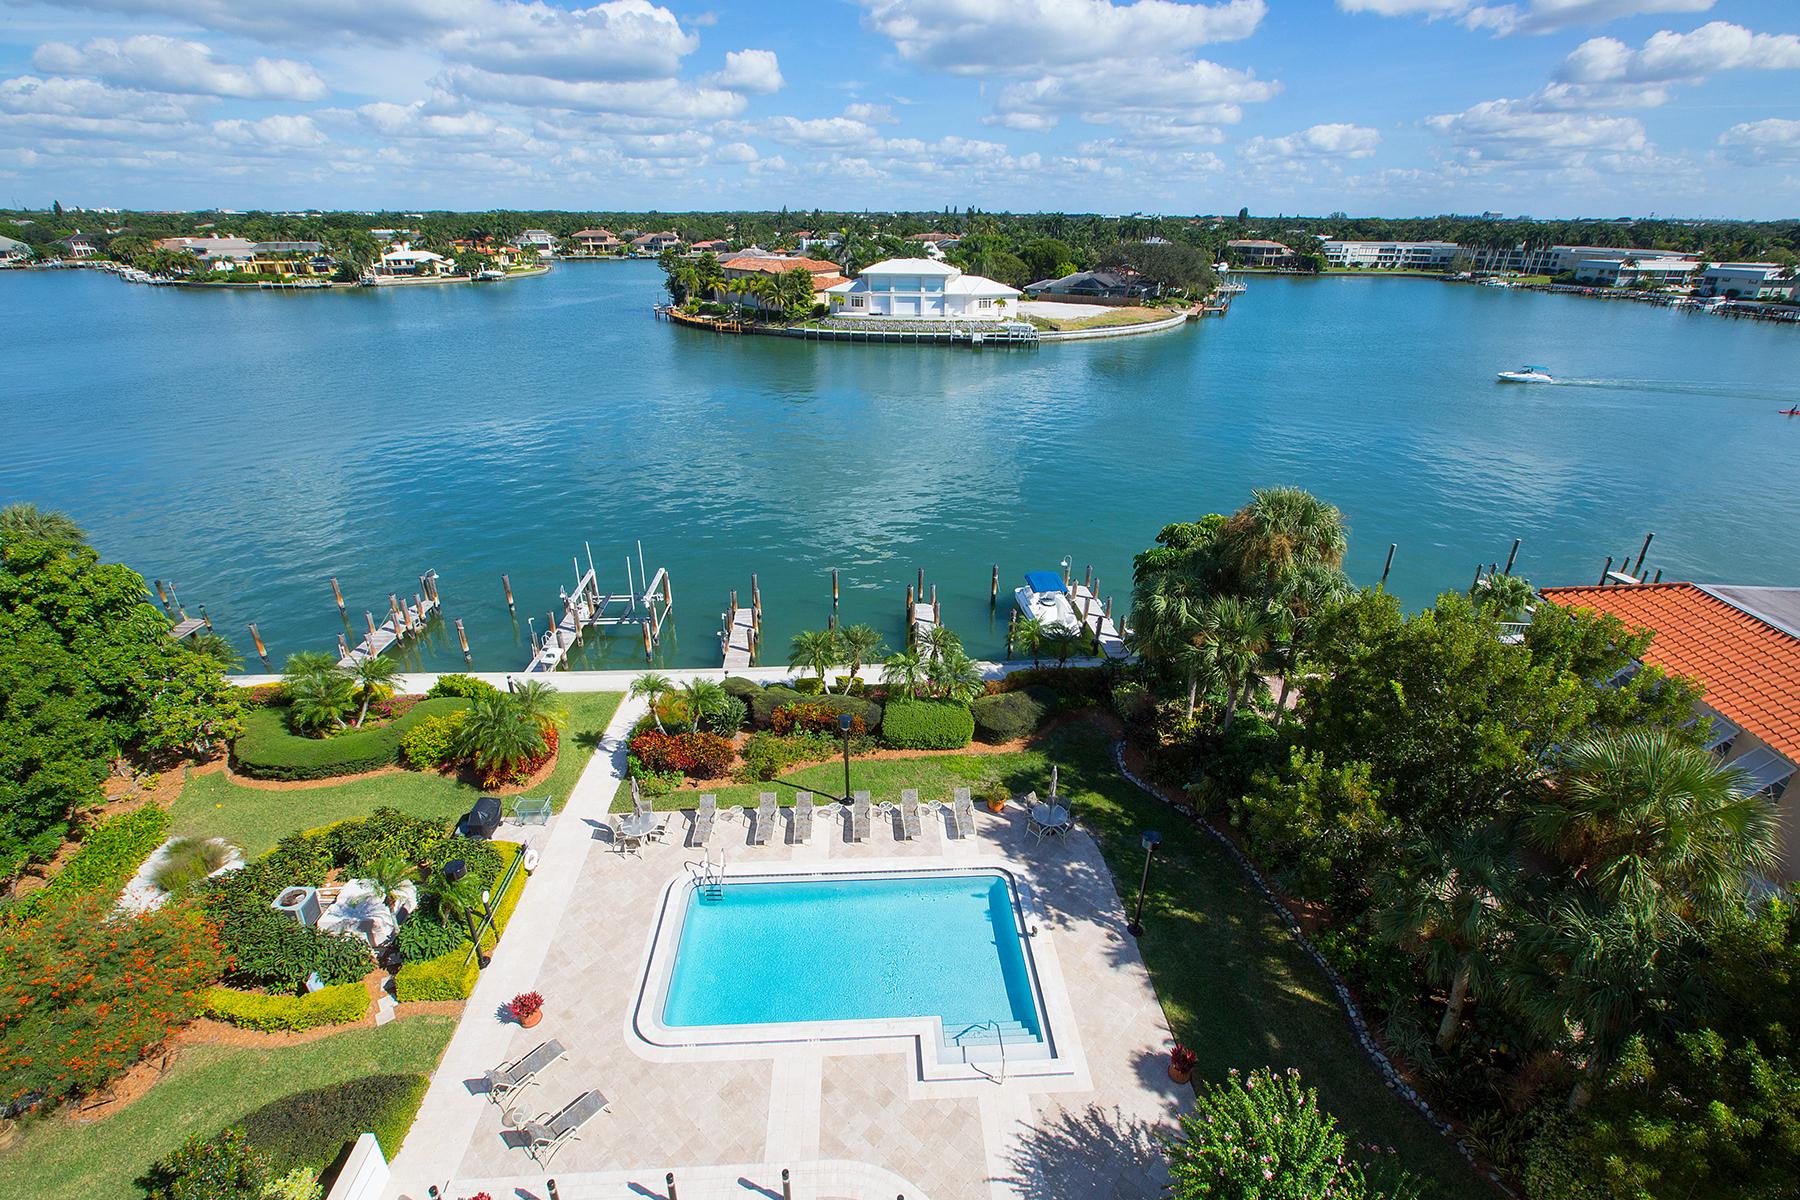 Condominium for Sale at MOORINGS - LUCERNE 3100 Gulf Shore Blvd N Unit 602 Naples, Florida, 34103 United States